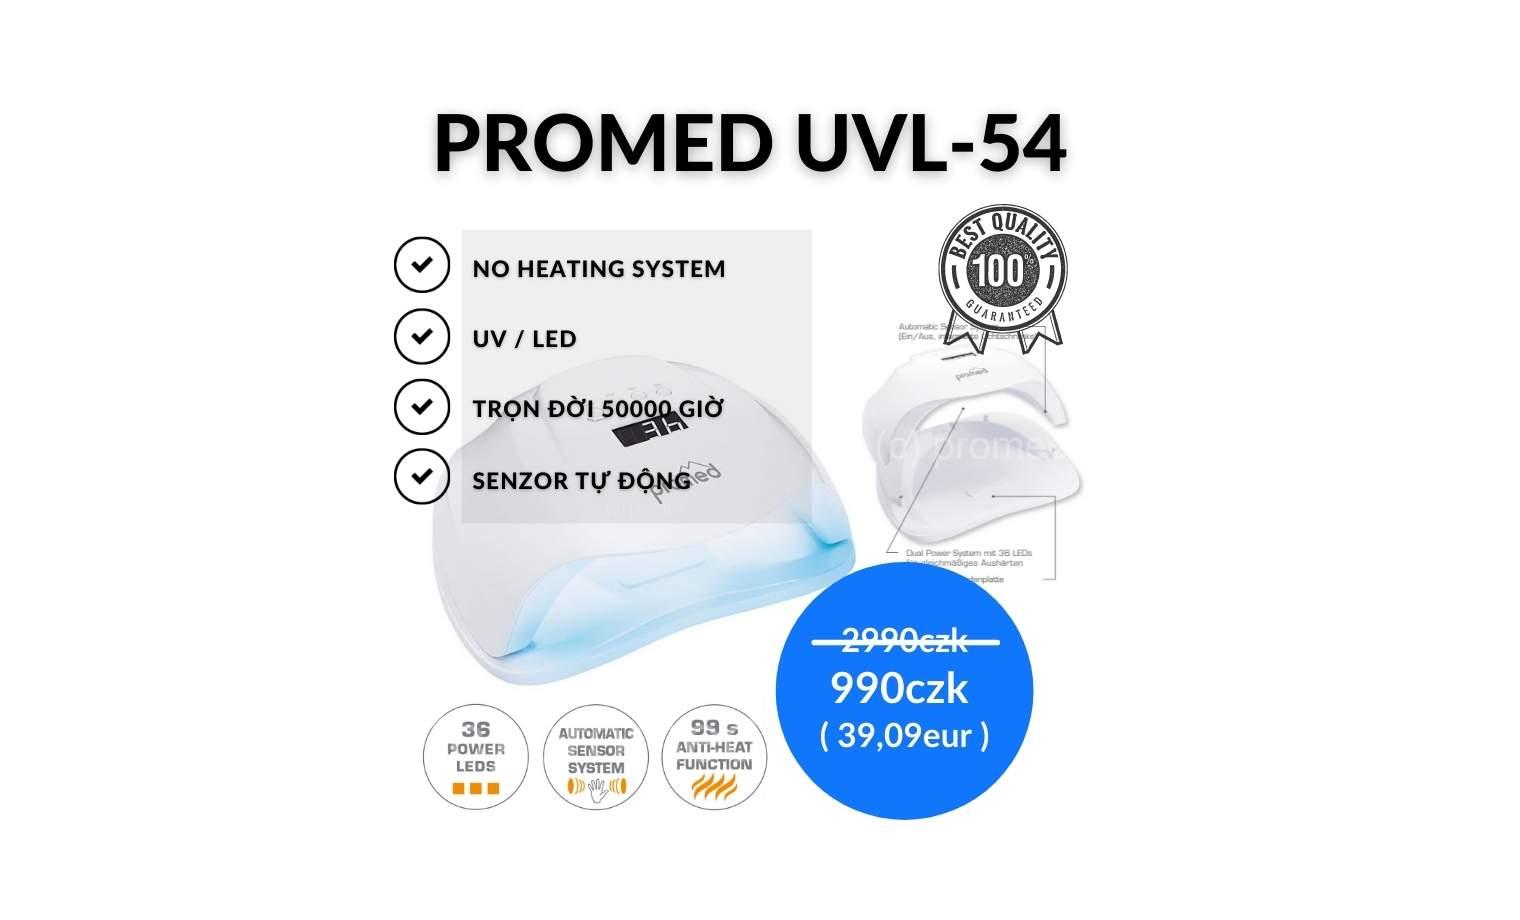 ĐÊN UV/LED UVL-54 - 990czk / 39,09eur